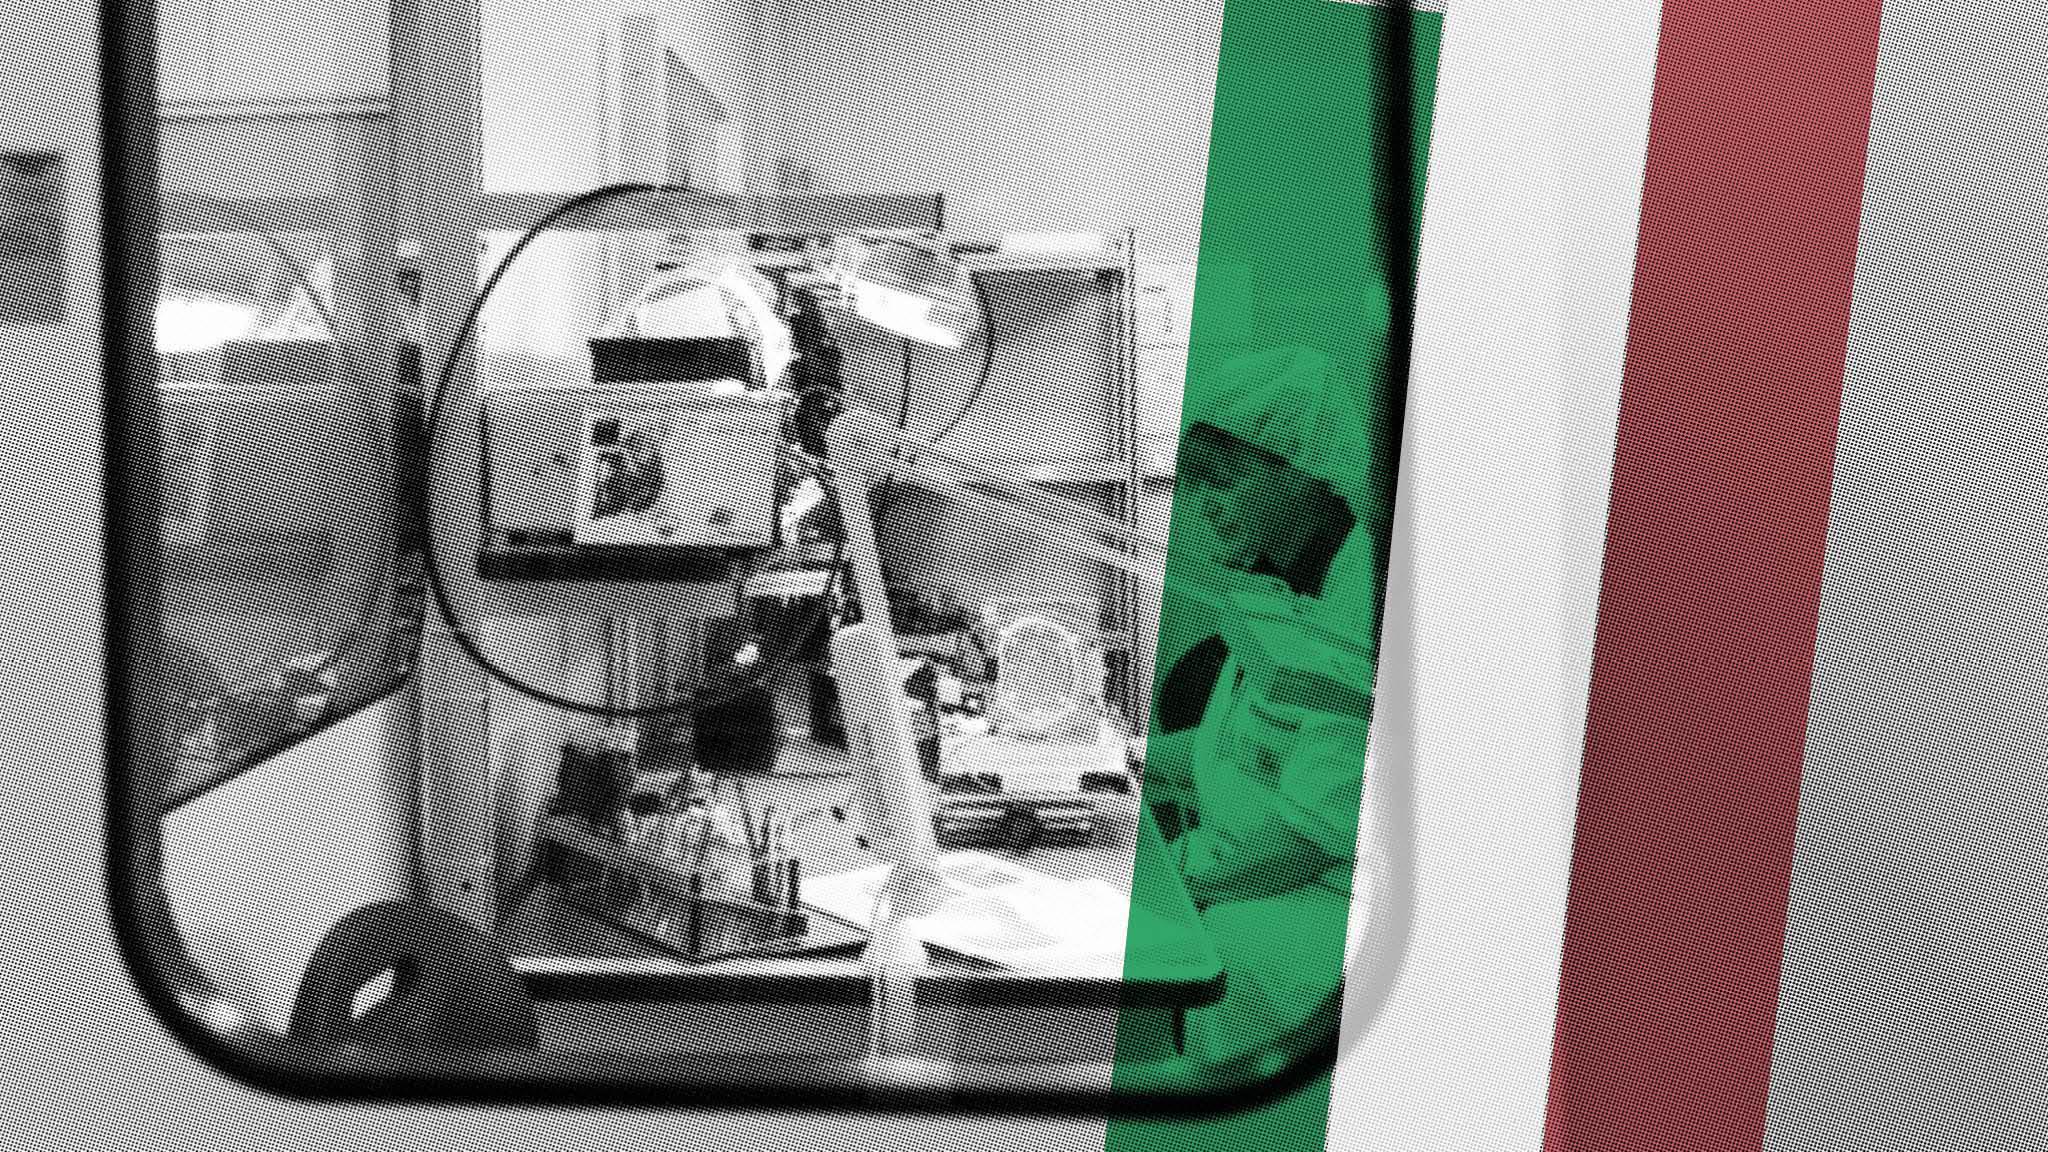 Europe's innovation comeback: Emilia Romagna leads Italy back